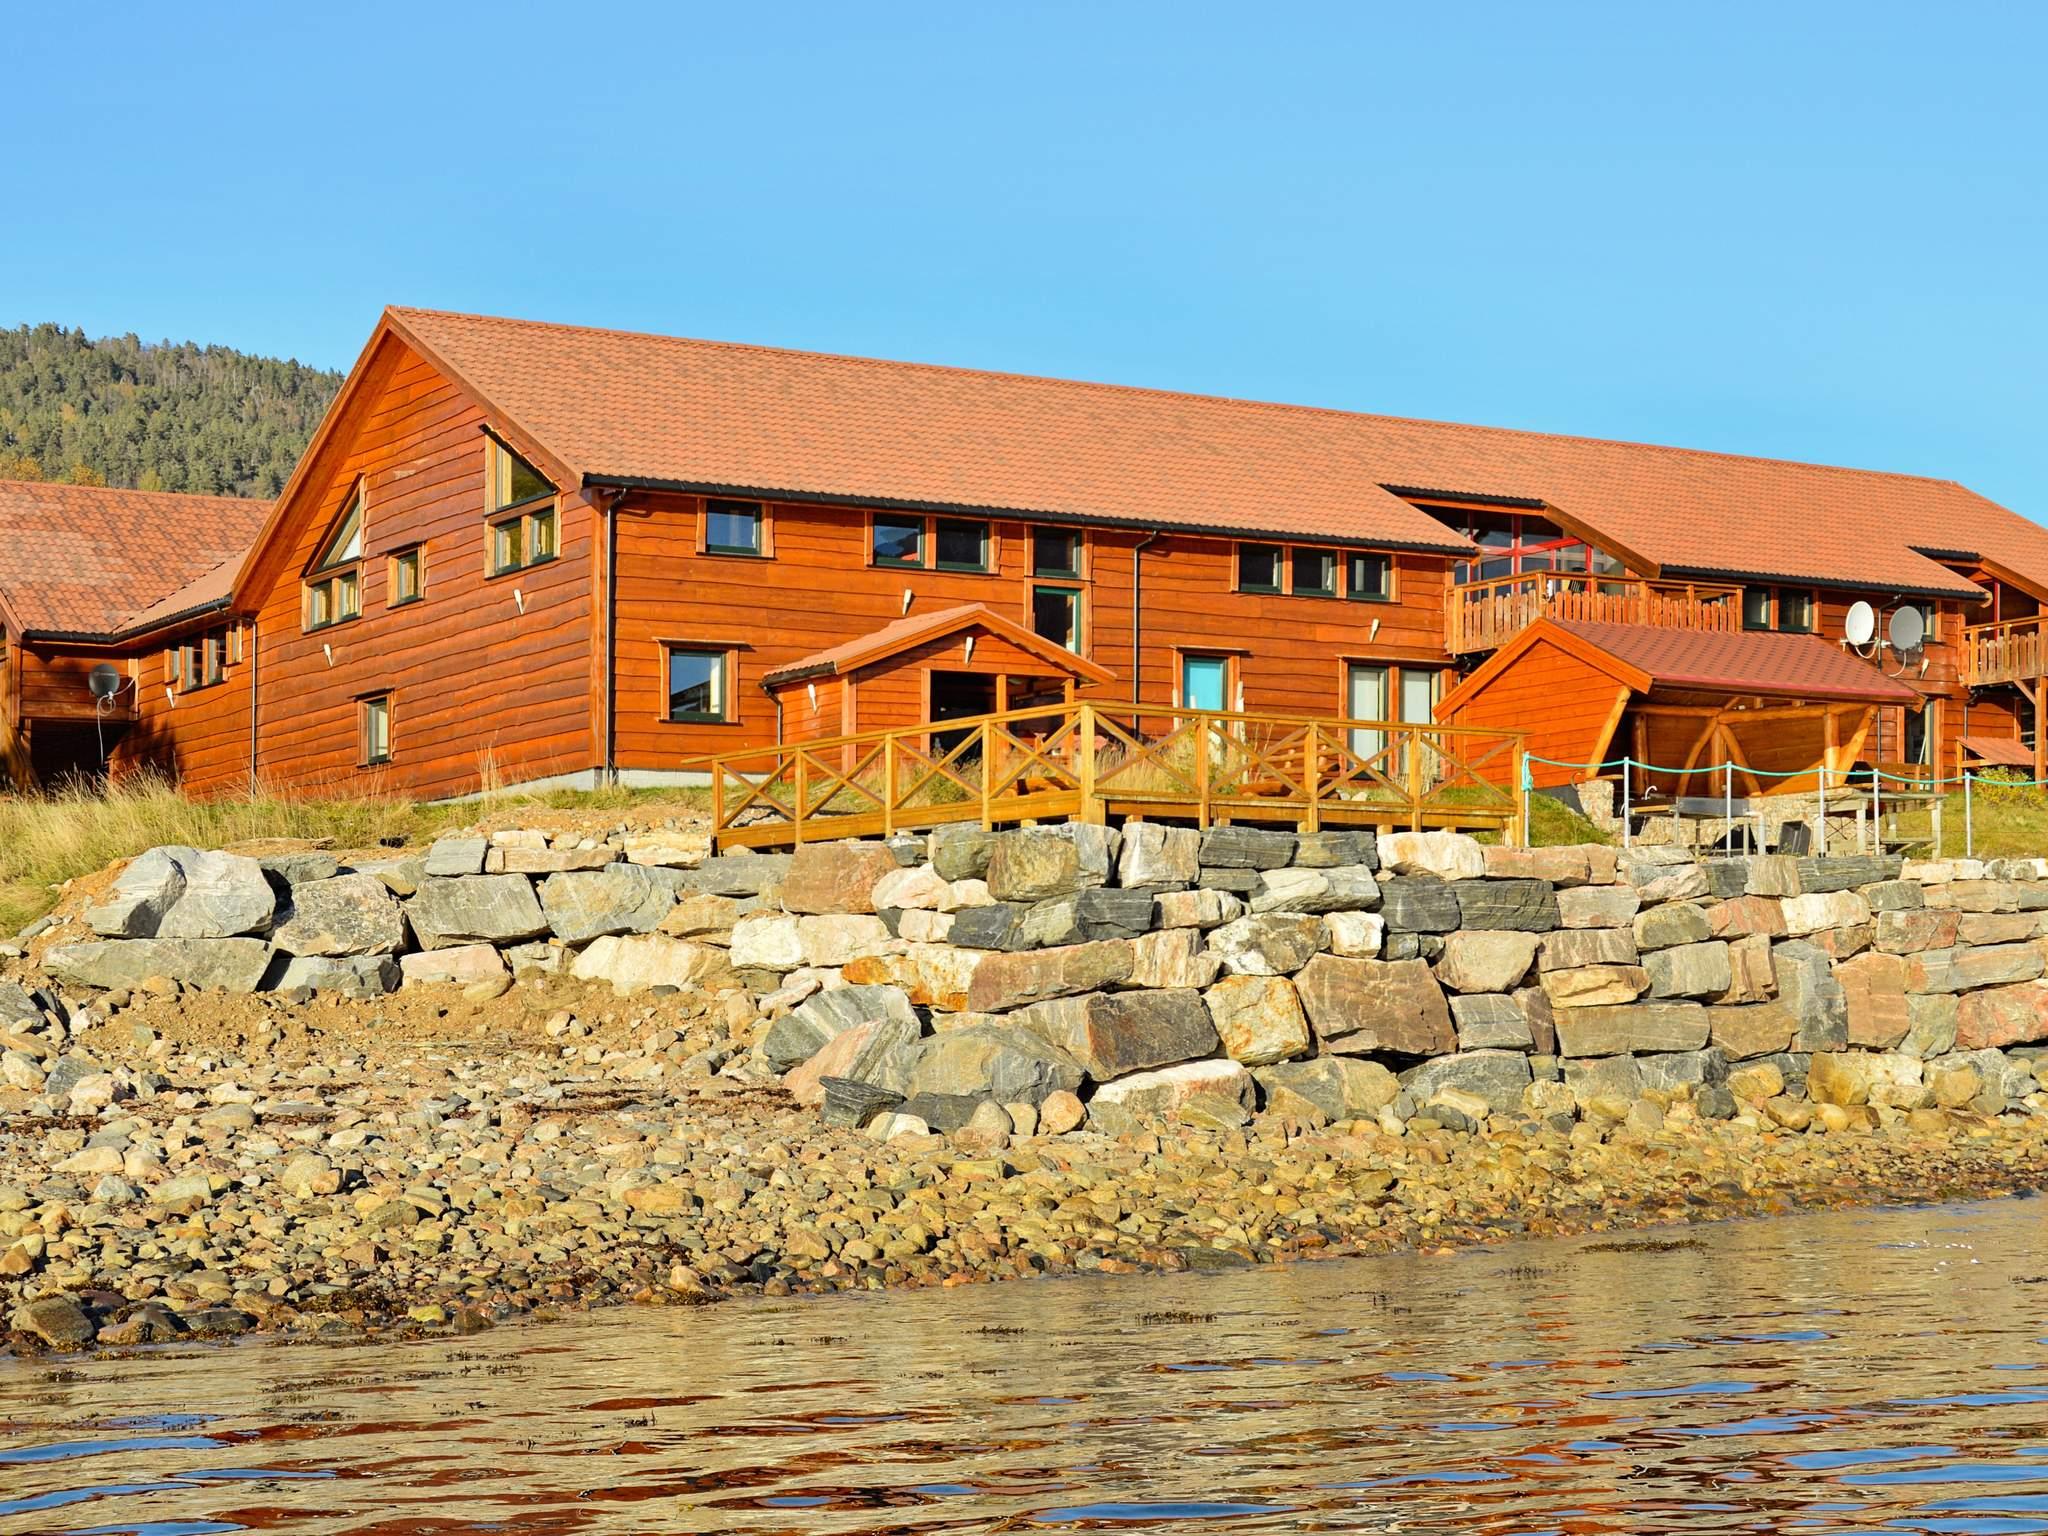 Ferienhaus Eidsvåg (135541), Eidsvåg, More - Romsdal, Westnorwegen, Norwegen, Bild 19